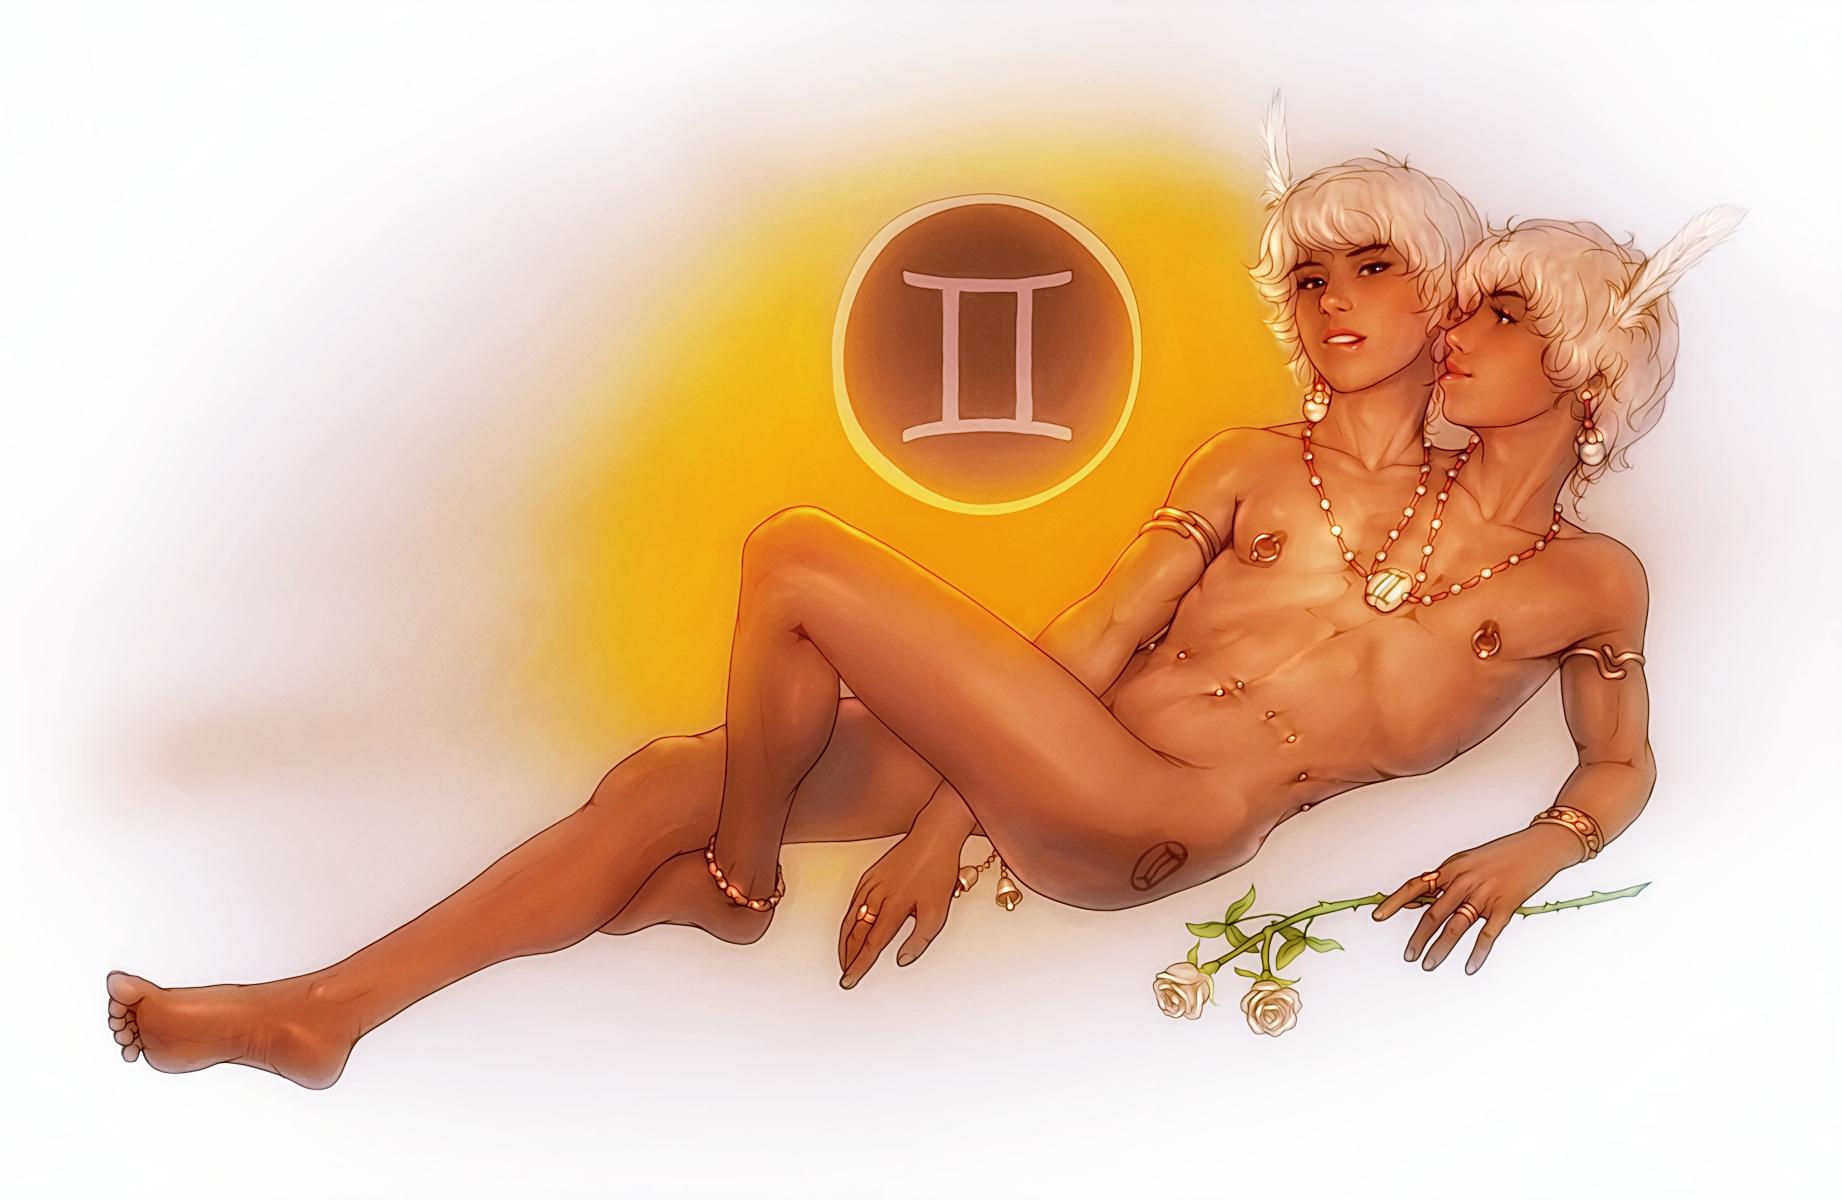 знаки зодиака картинки эротические